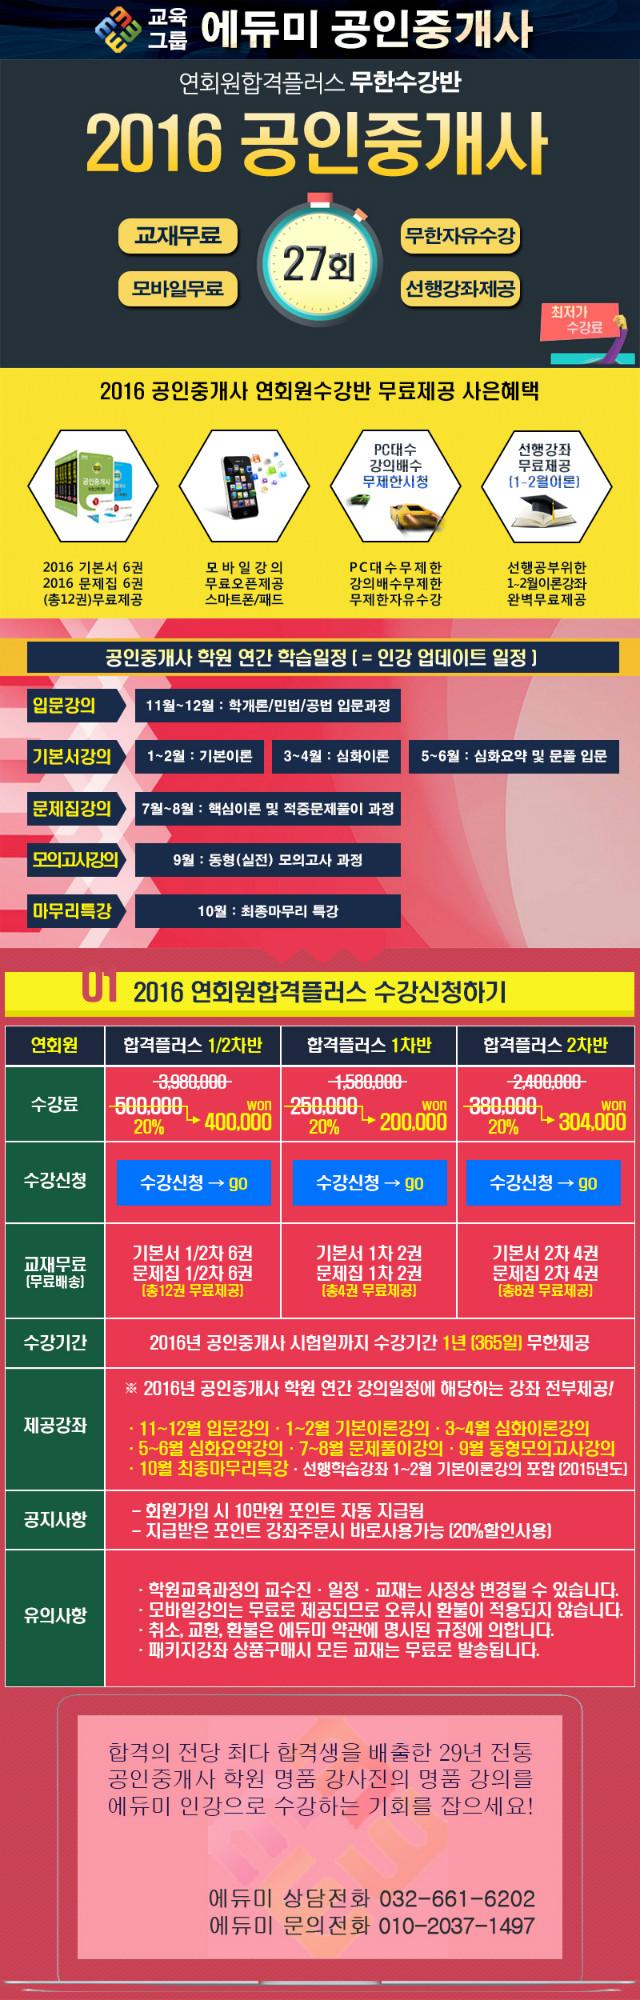 2016_gongin_event.jpg